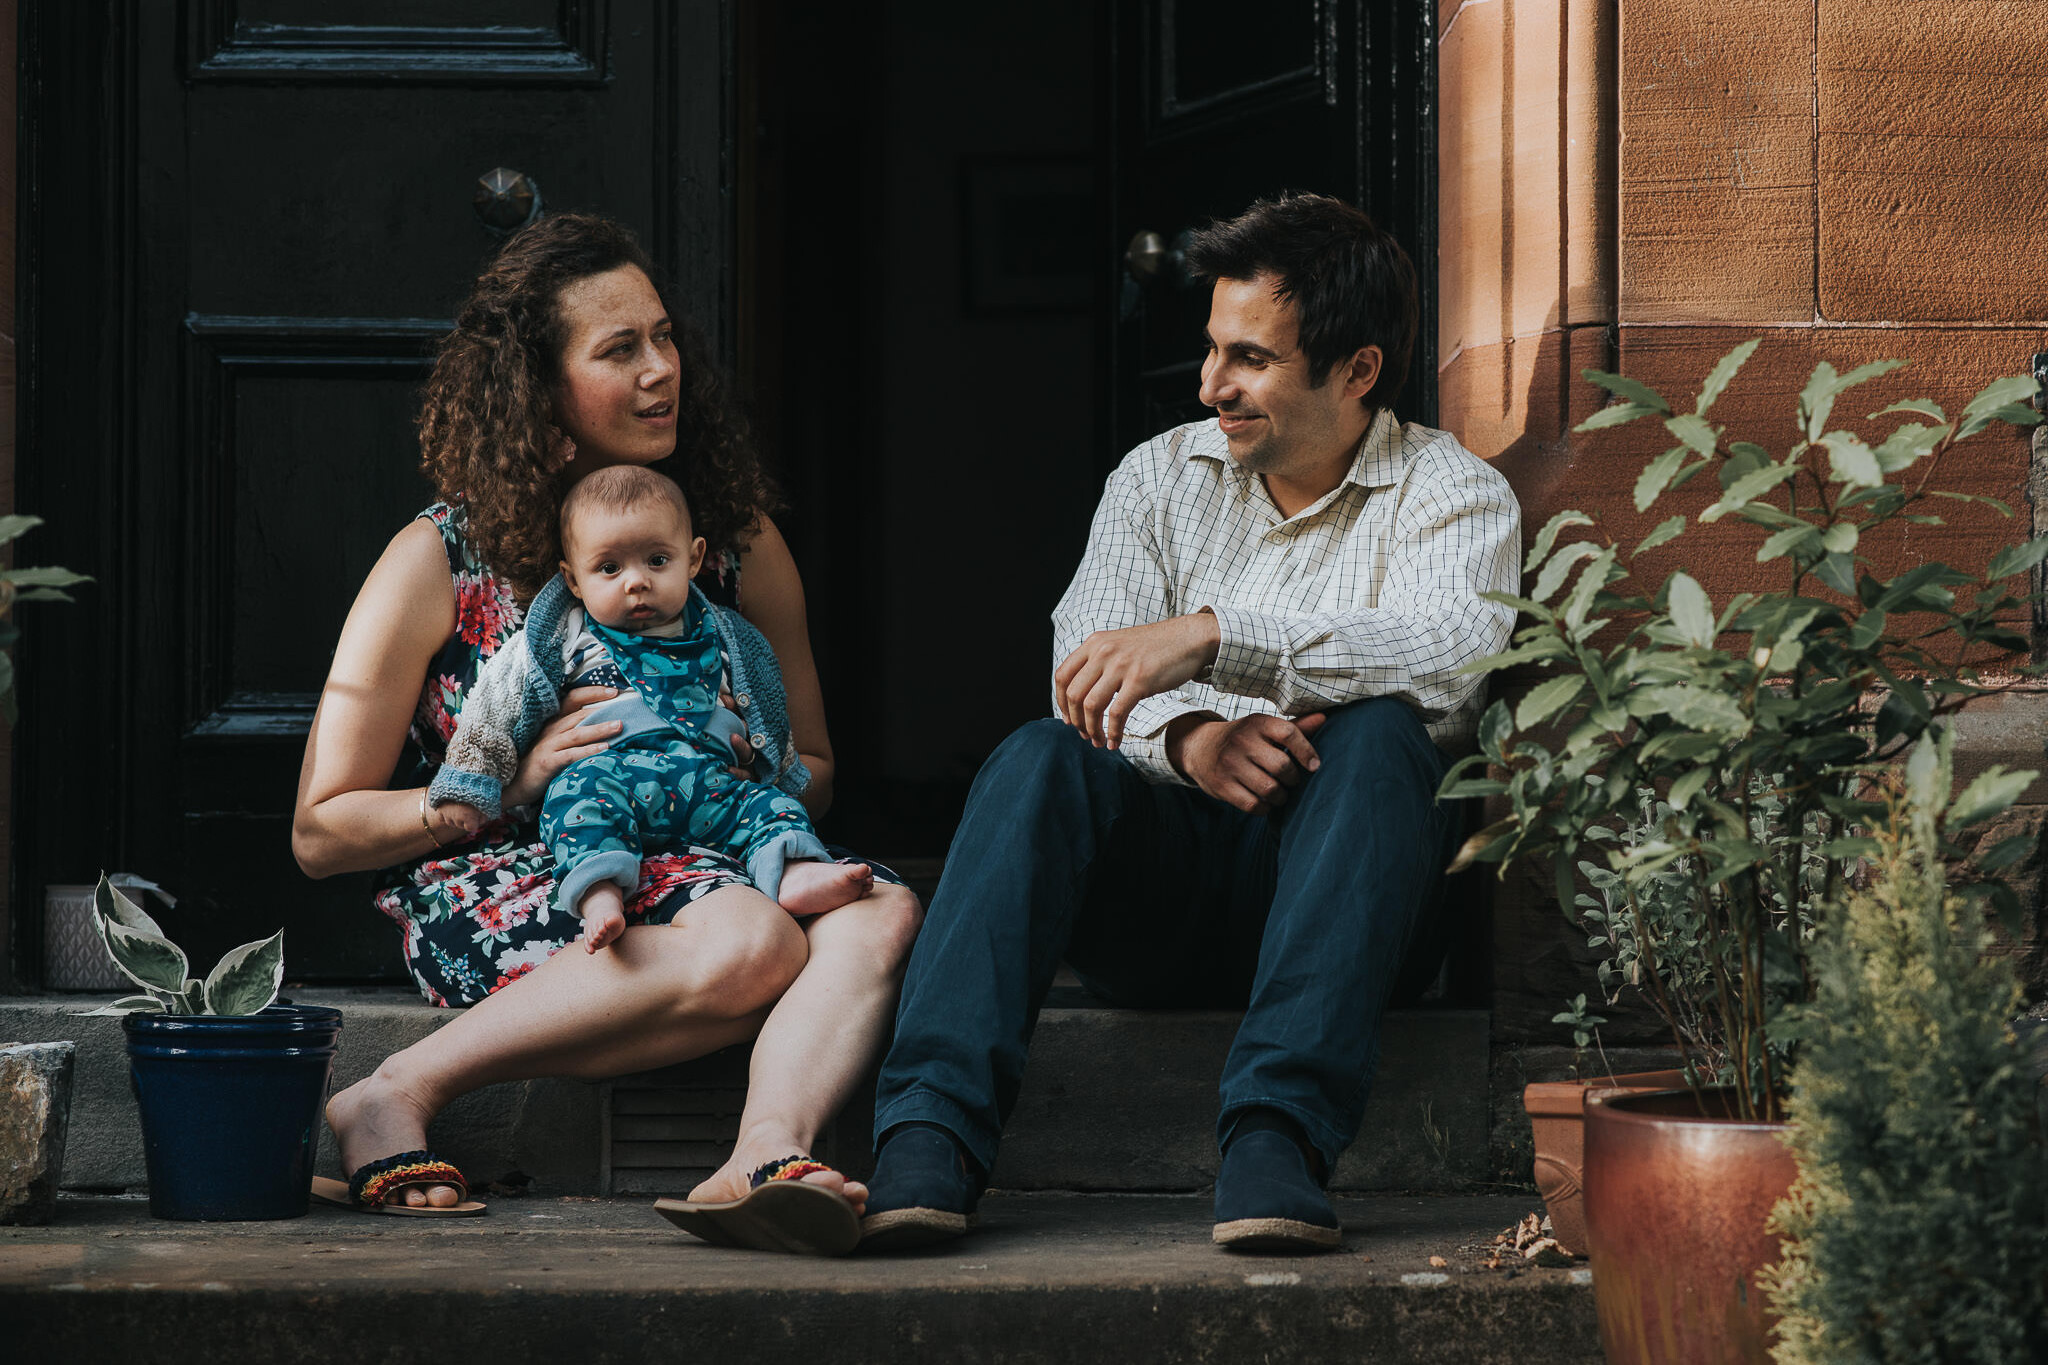 Doorstep Family Portrait Shoot